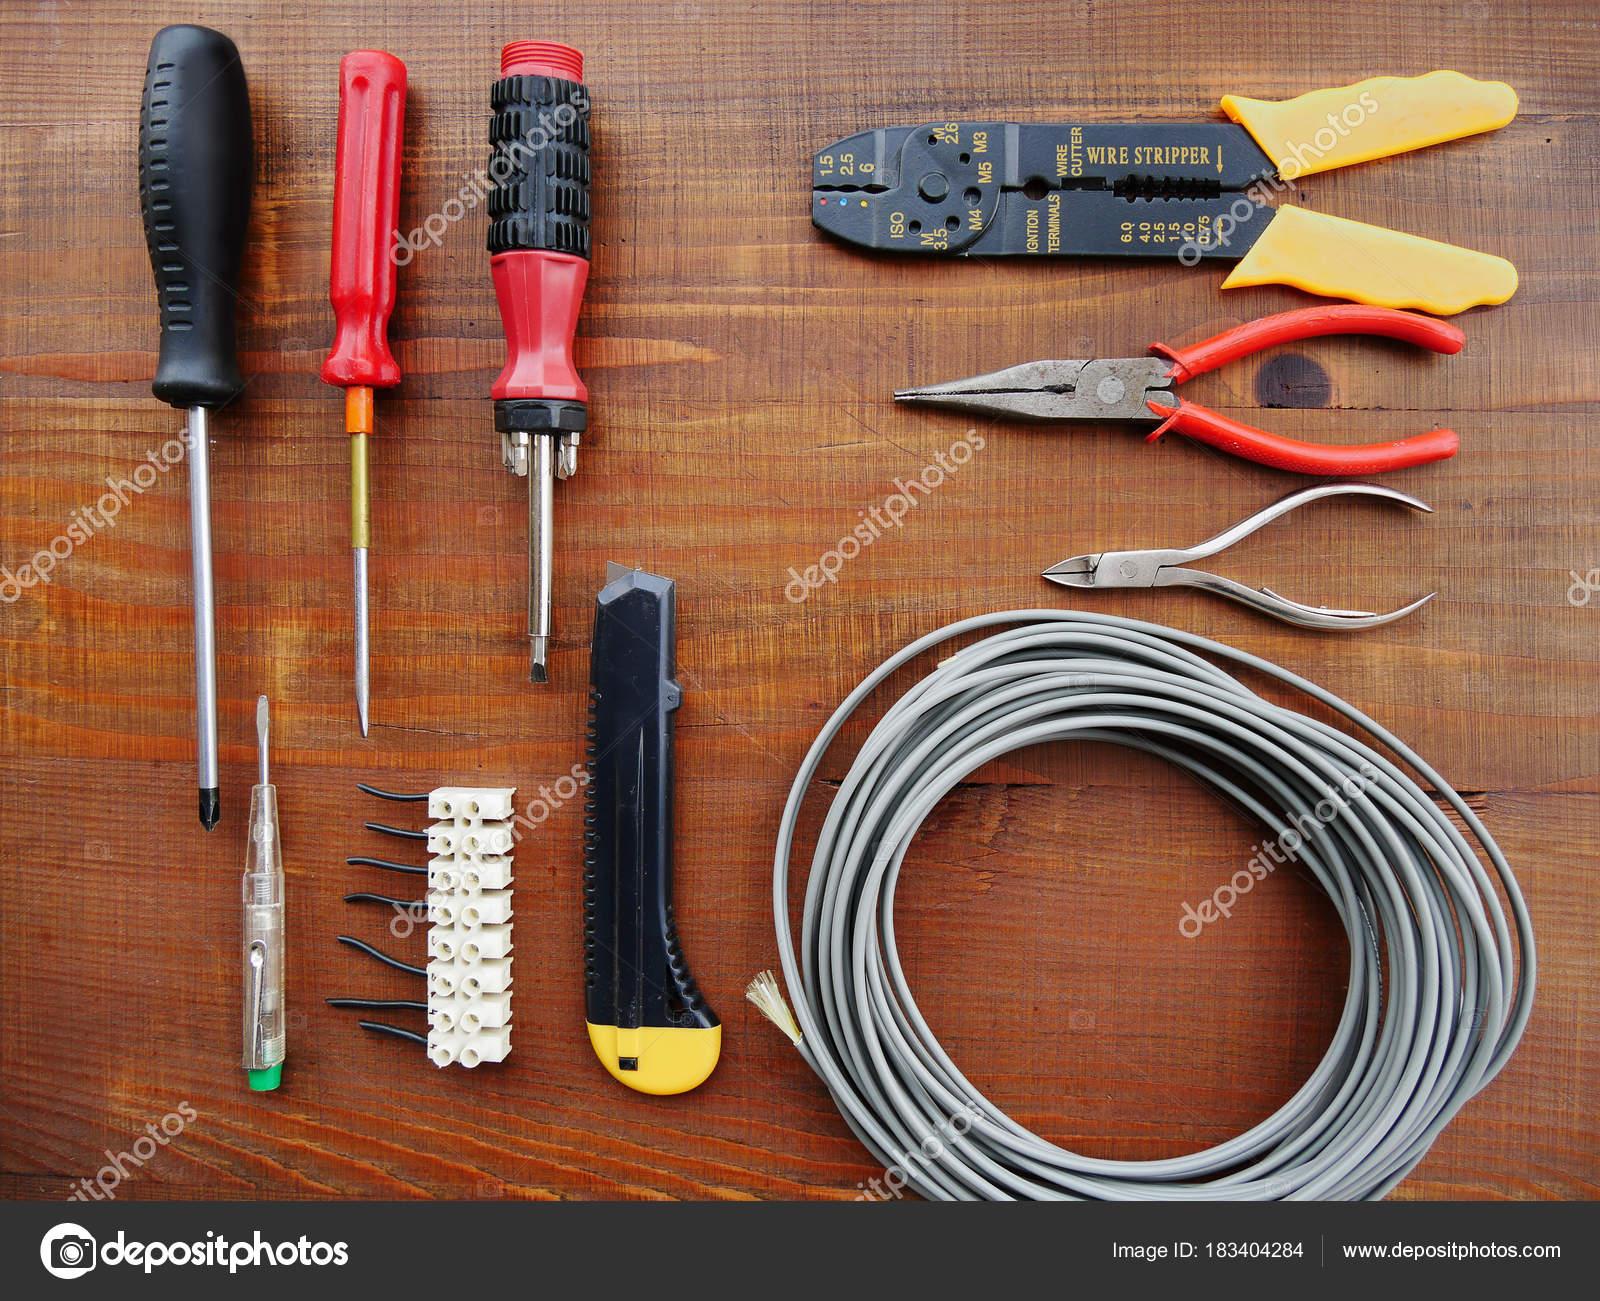 depositphotos_183404284 stock photo vintage hand tools for electricians vintage hand tools for electricians stock photo © whiteaster